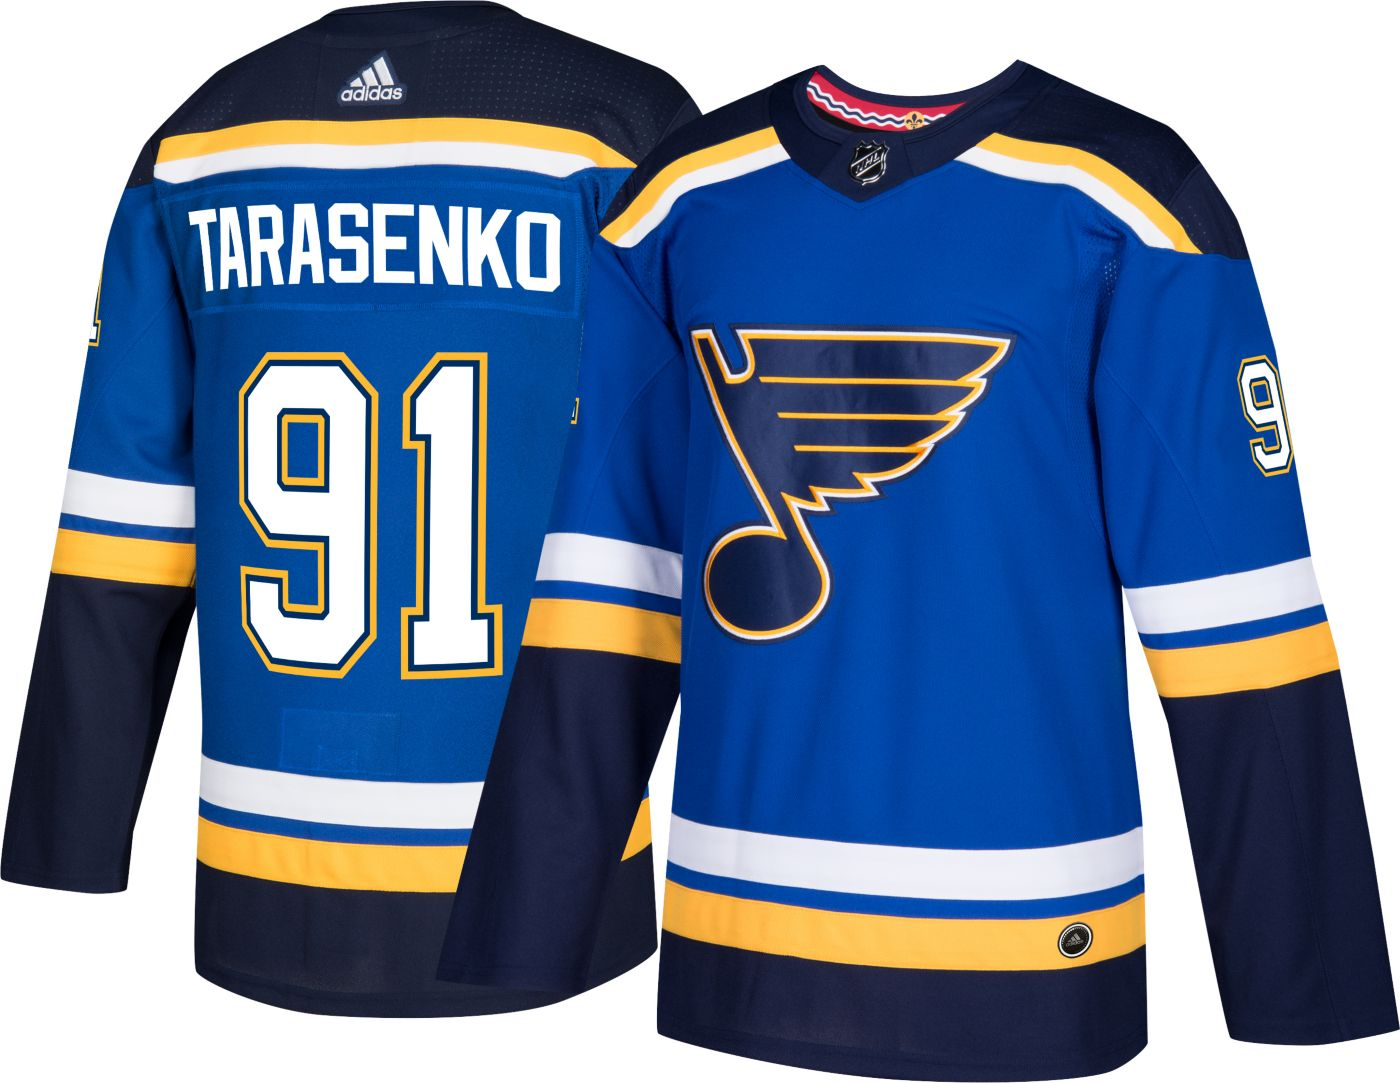 adidas Men's St. Louis Blues Vladimir Tarasenko #91 Authentic Pro Home Jersey